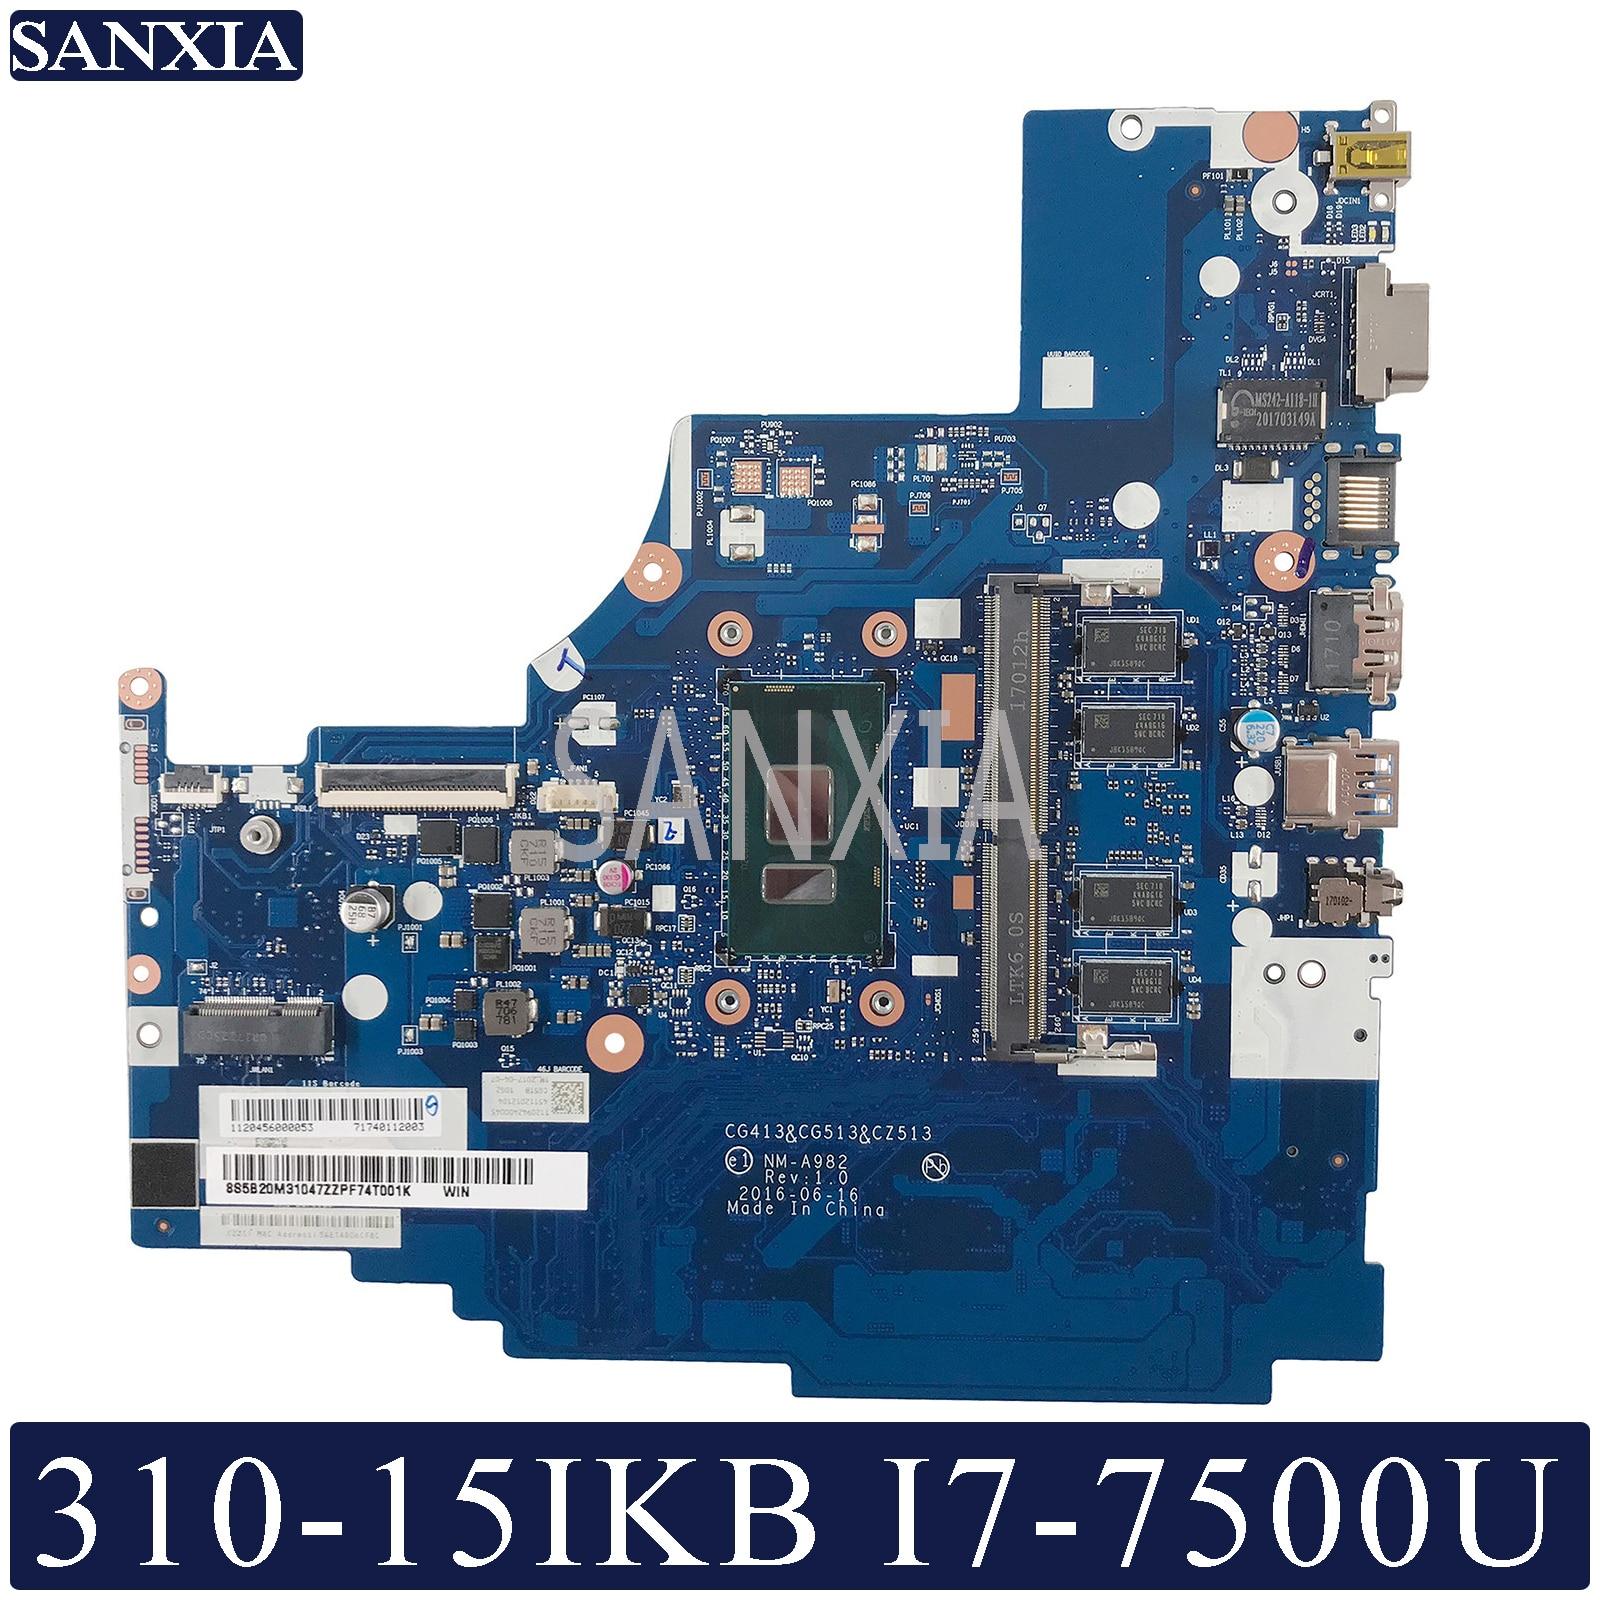 KEFU NM-A982 اللوحة المحمول لينوفو 310-15IKB اللوحة الأصلية 4G-RAM I7-7500U